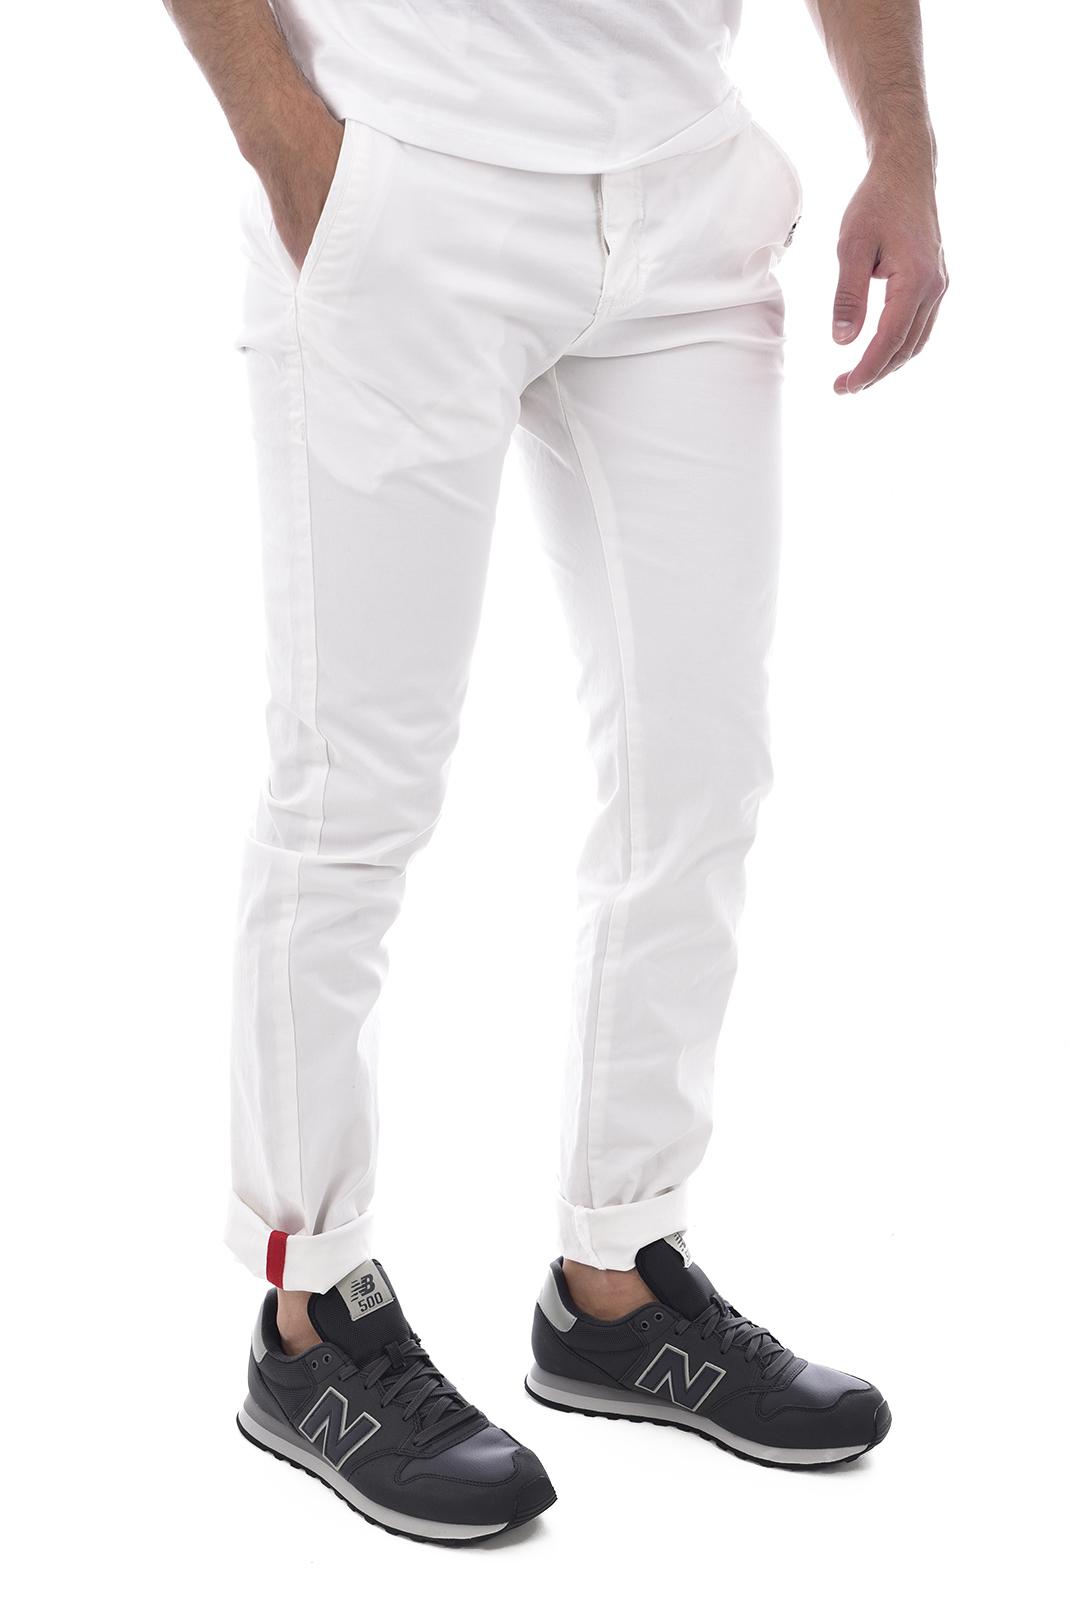 Pantalons chino/citadin  Hite couture KIDITA BLANC